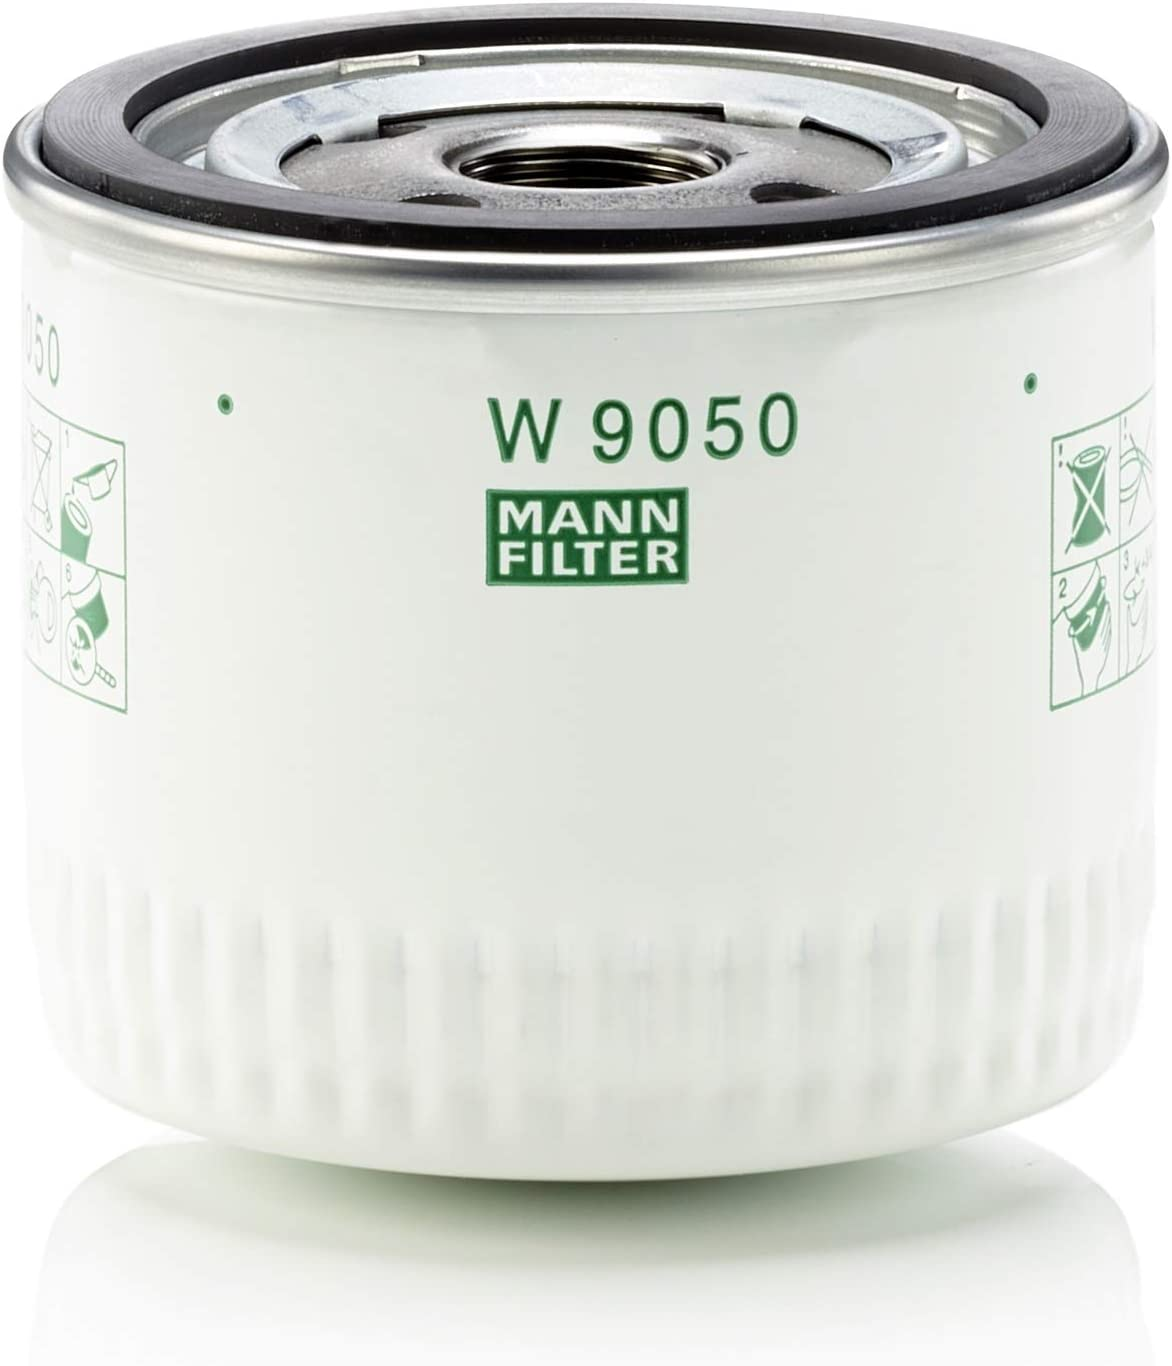 MANN-FILTER W 9050 Original Filtro de Aceite, Para automóviles ...